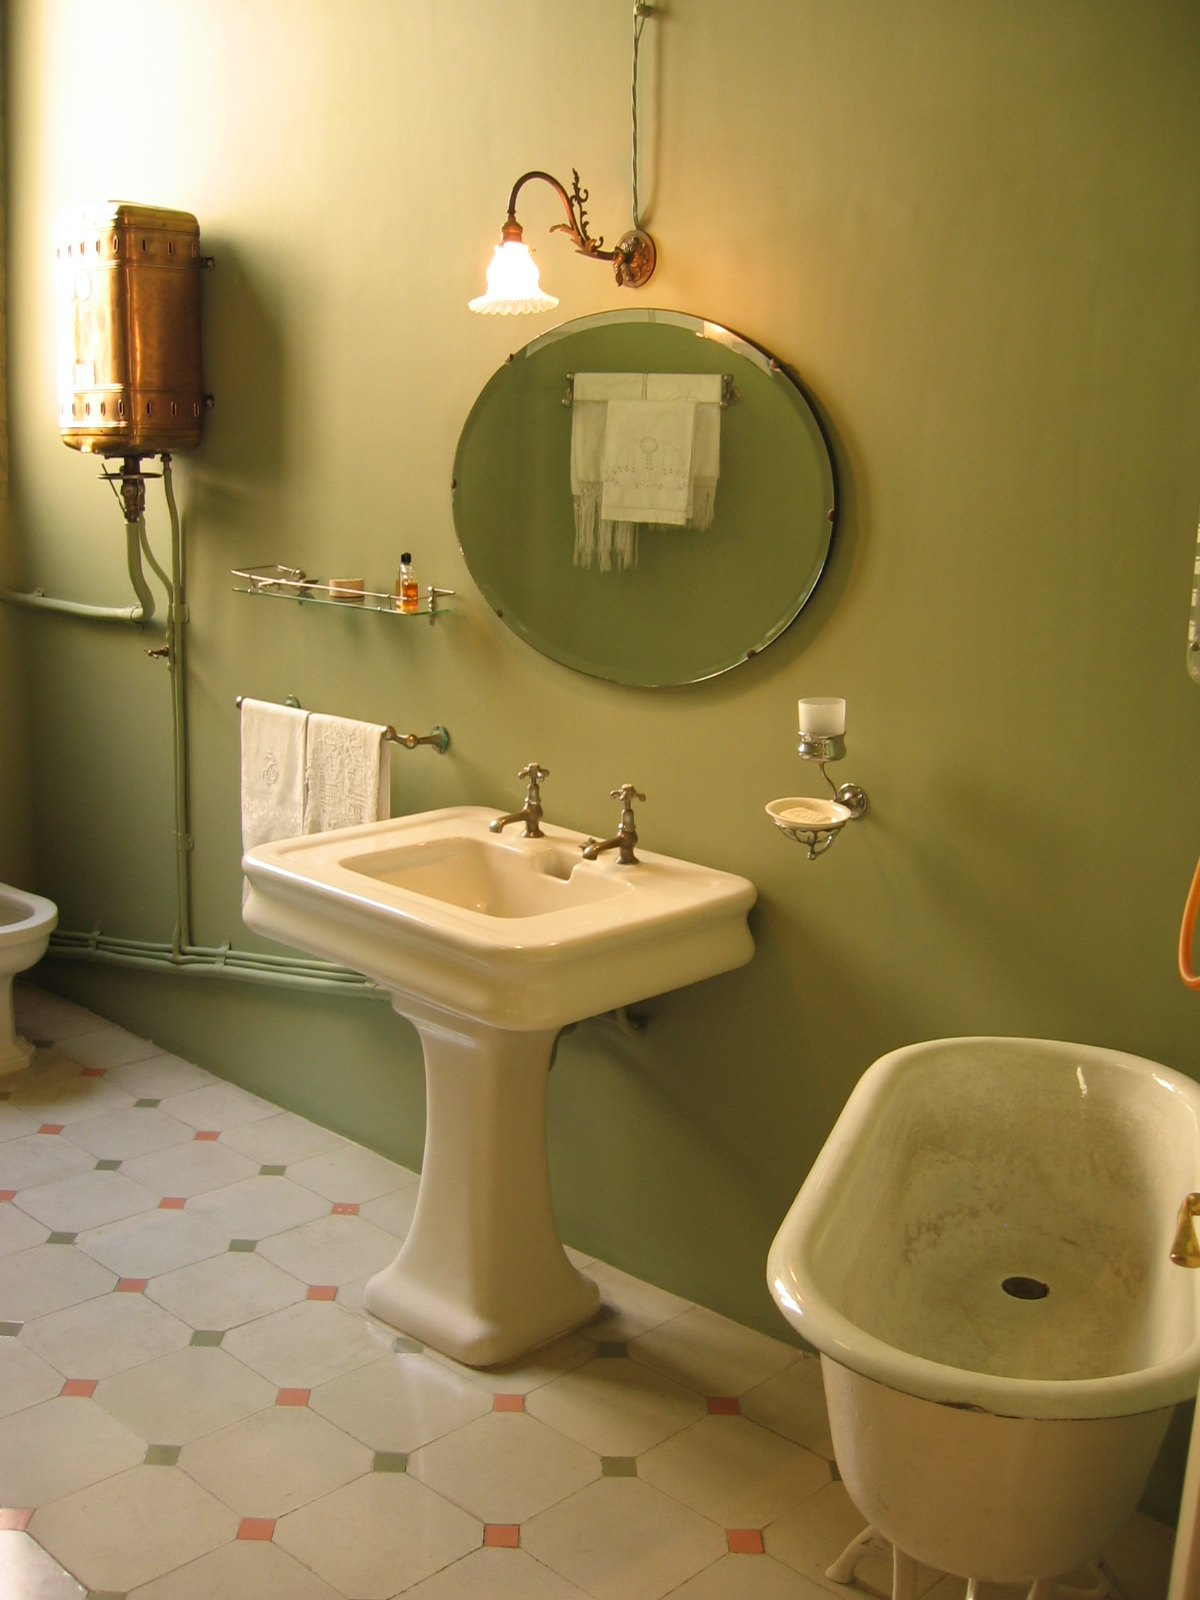 Decoracion Ba?os Modernos ~ http  decoracioninteriores net wp content bathroom3 jpg